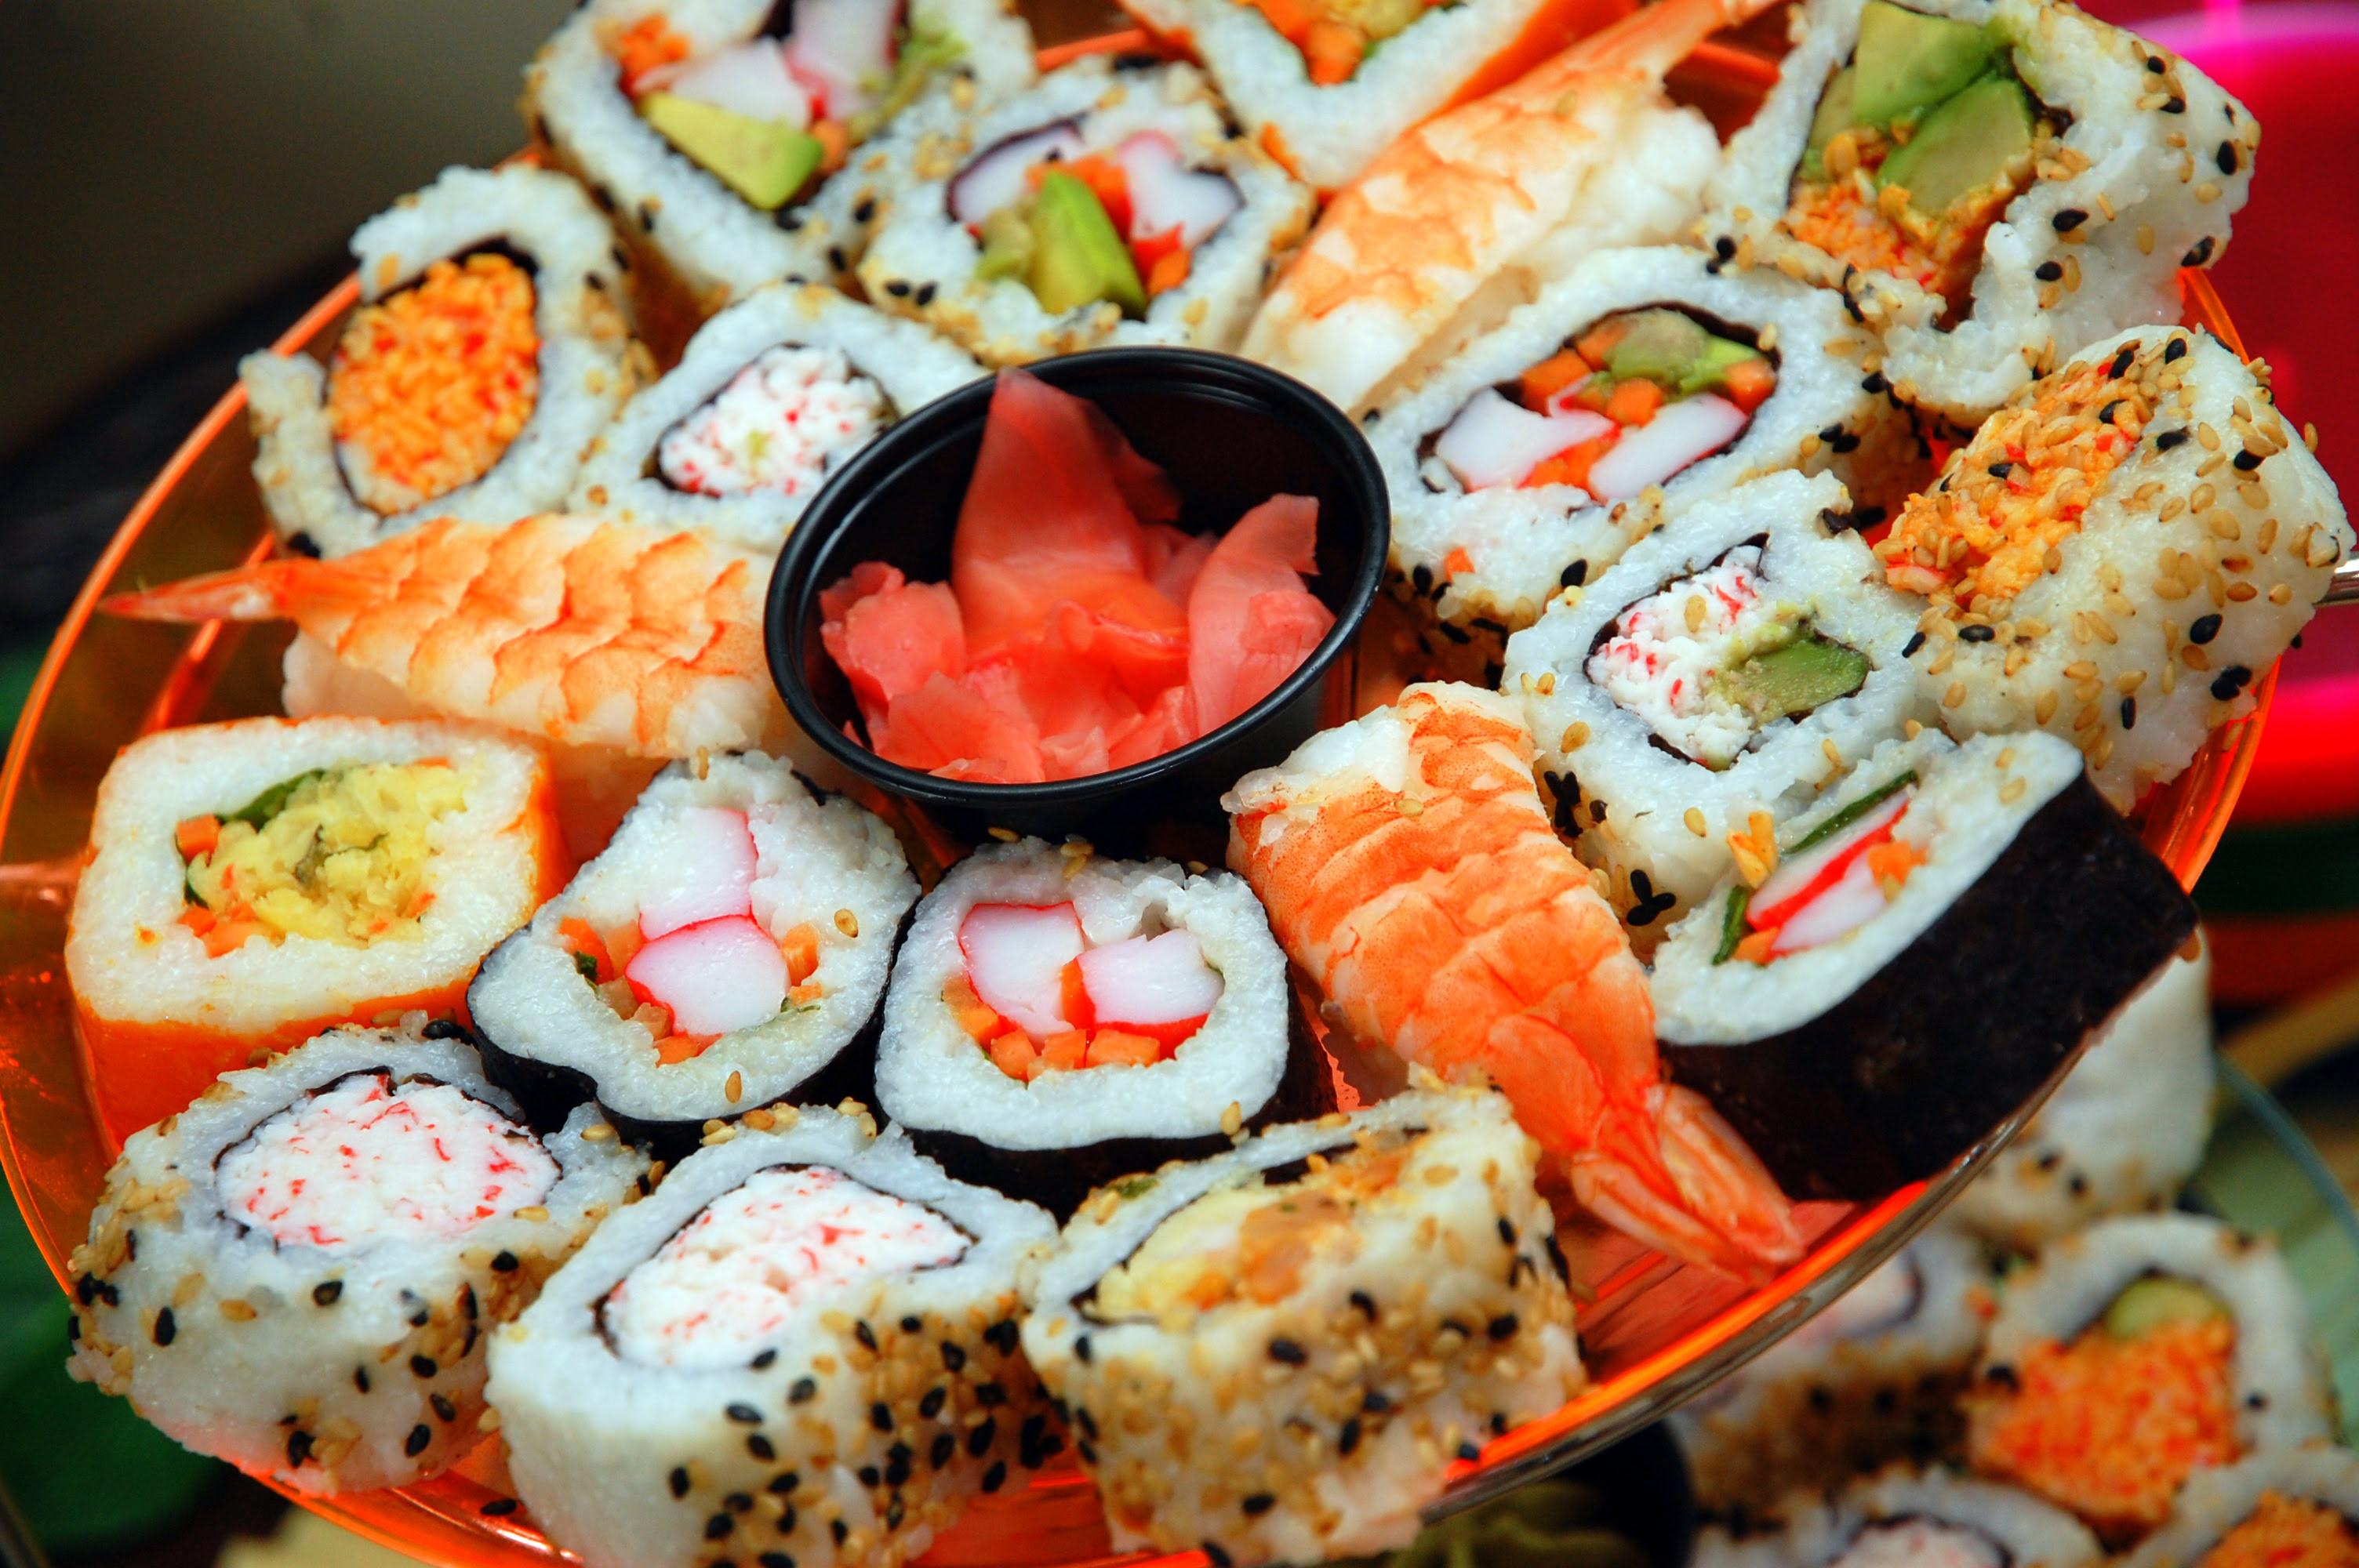 File Assortment of sushi May 2020 jpg Wikimedia Commons